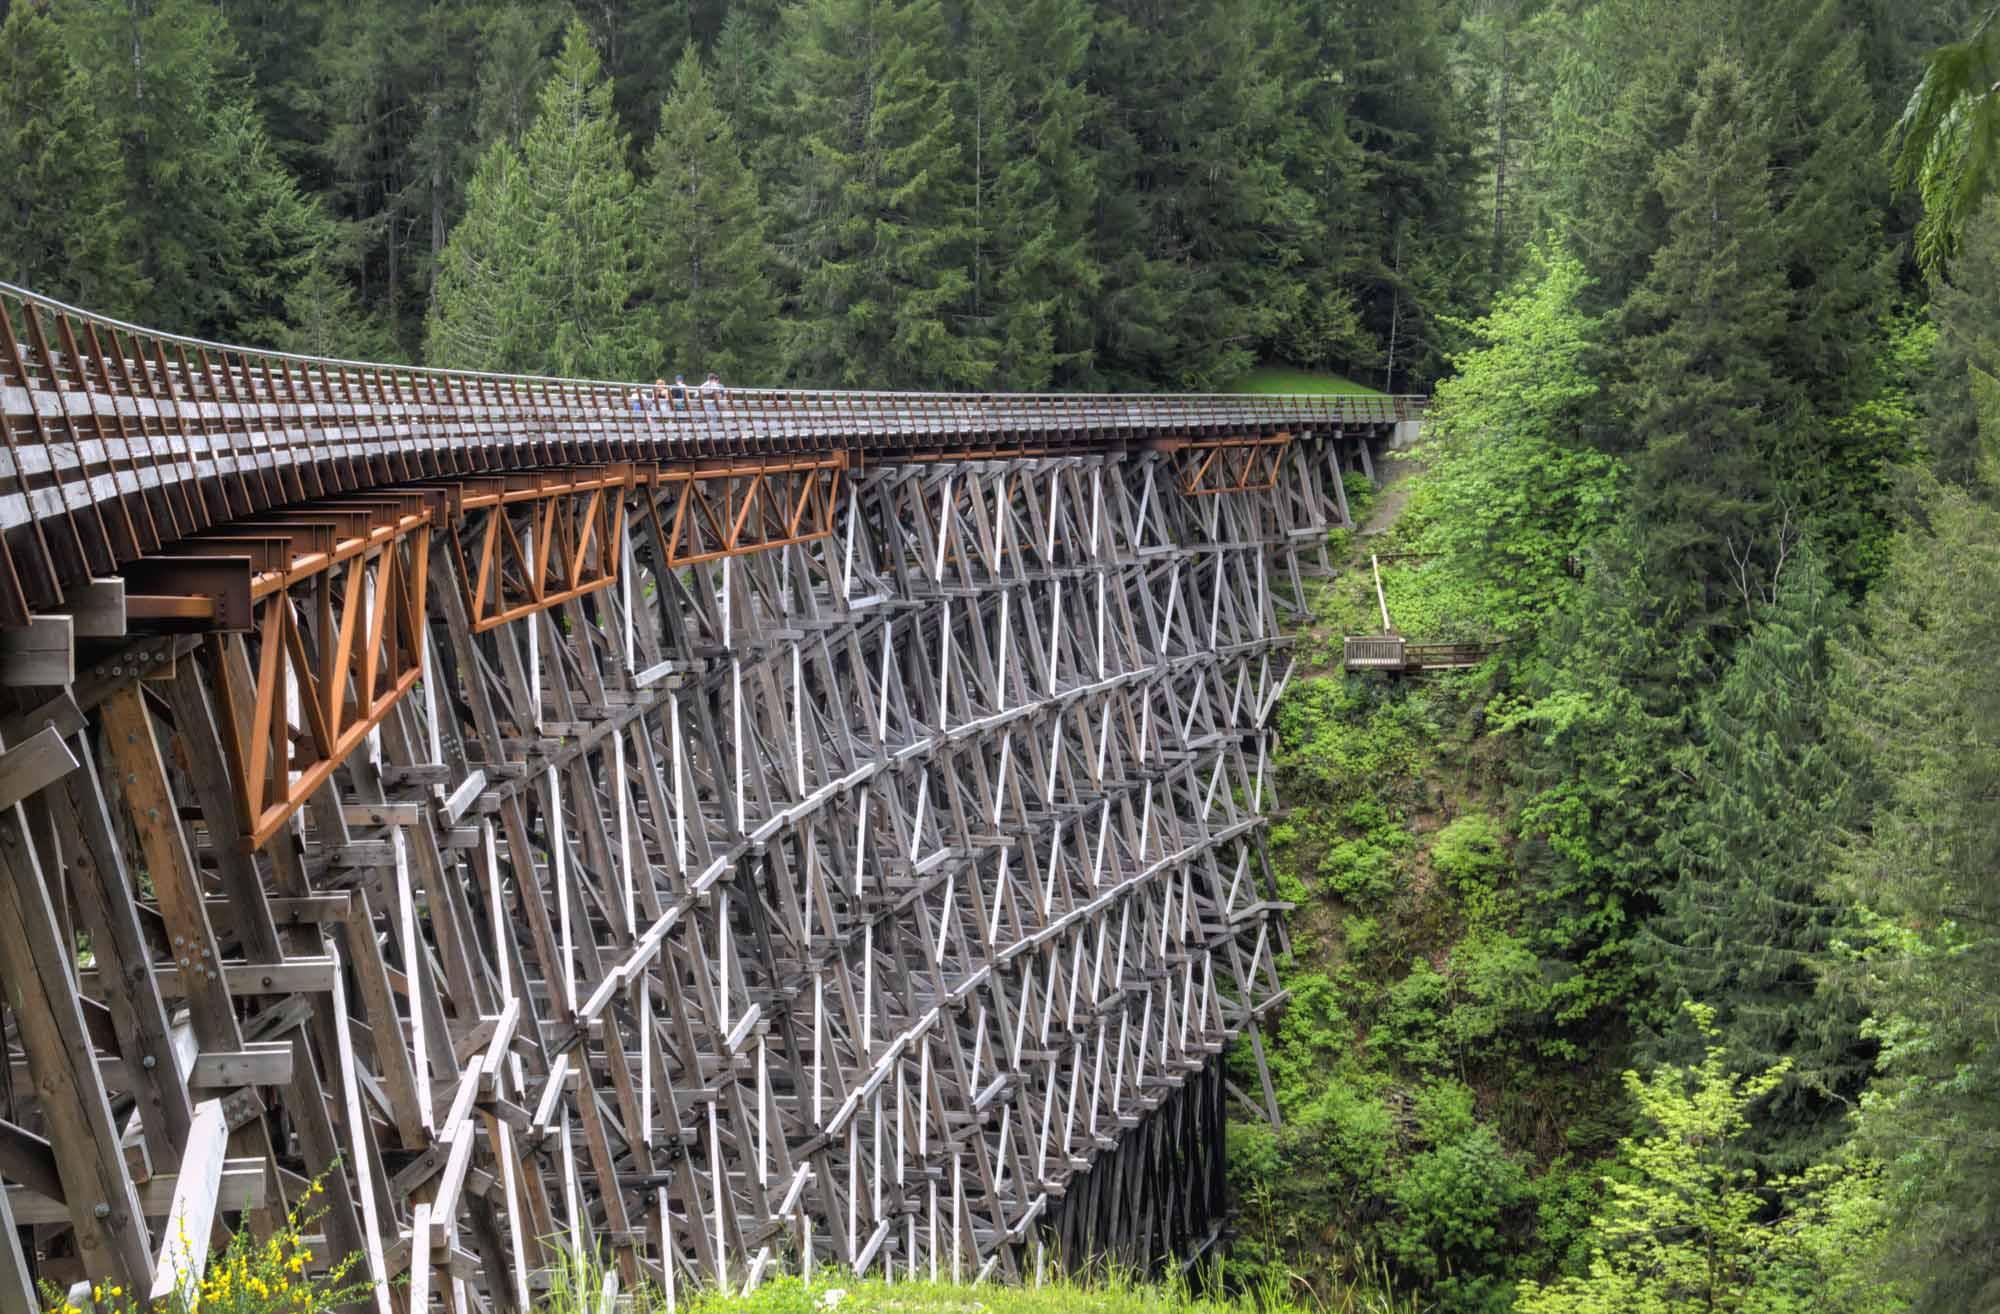 Historic Railway Trestle